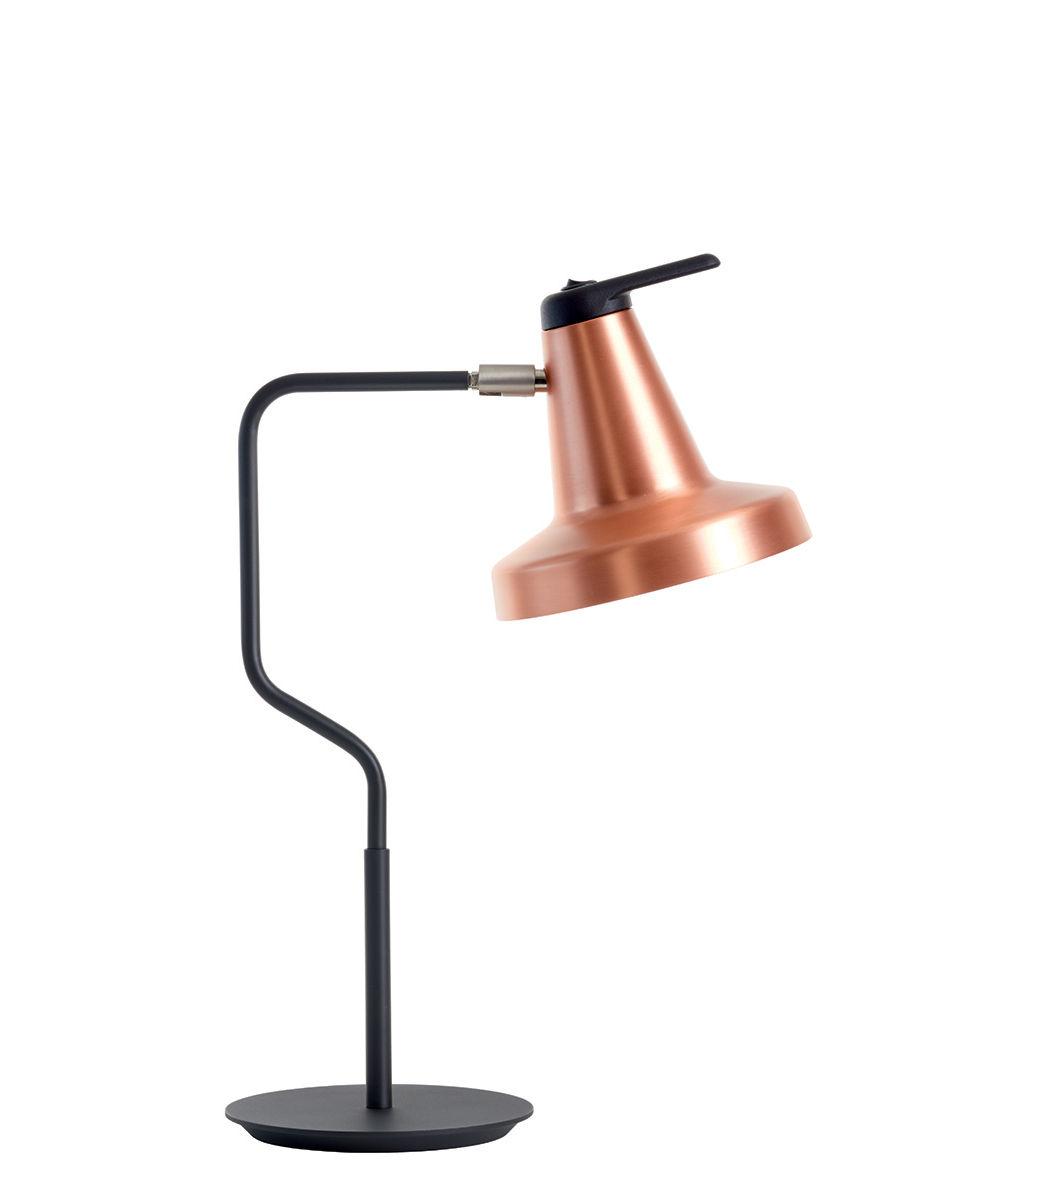 Lighting - Table Lamps - Garçon Table lamp - / Adjustable by Carpyen - Copper - Lacquered metal